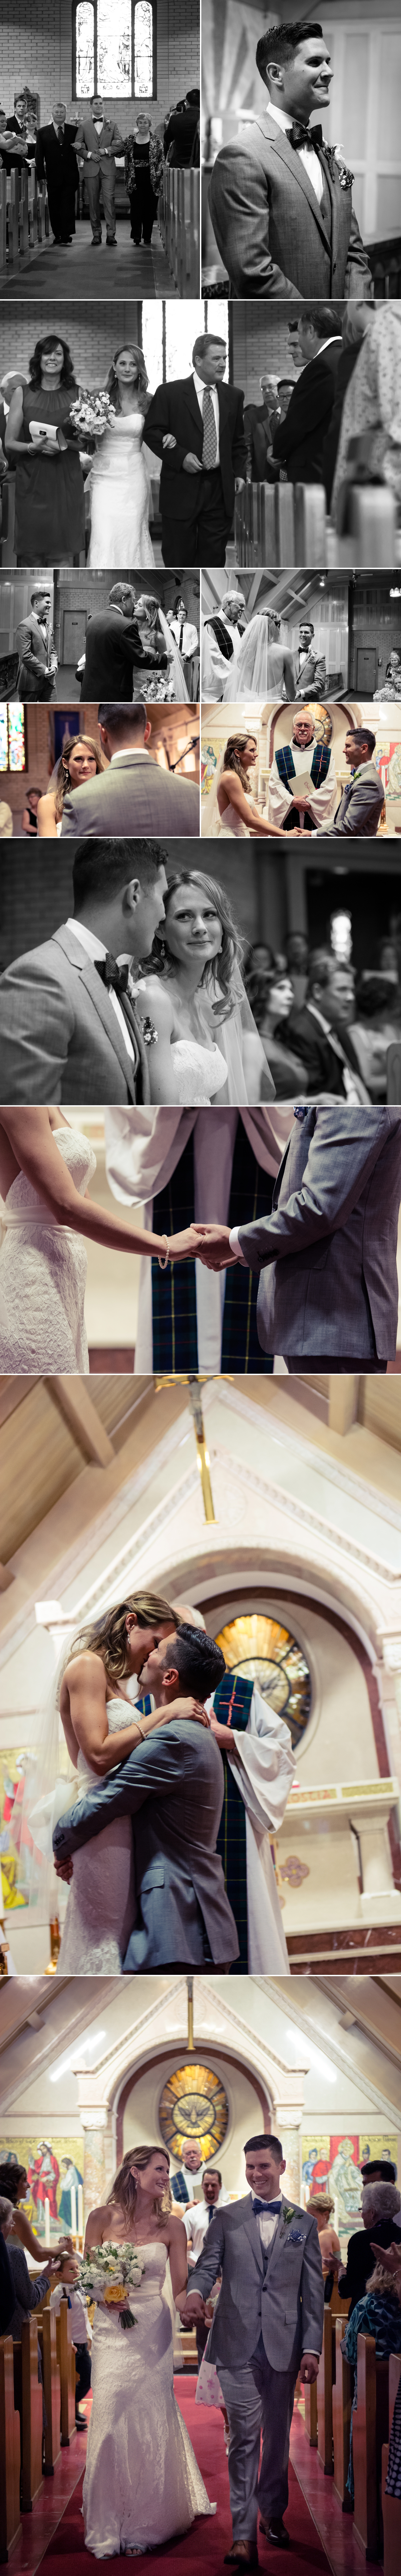 Wedding at Mt. Norquay in Banff, Alberta, Canada. Photography Friday Design + Photography from Edmonton, Alberta, Canada